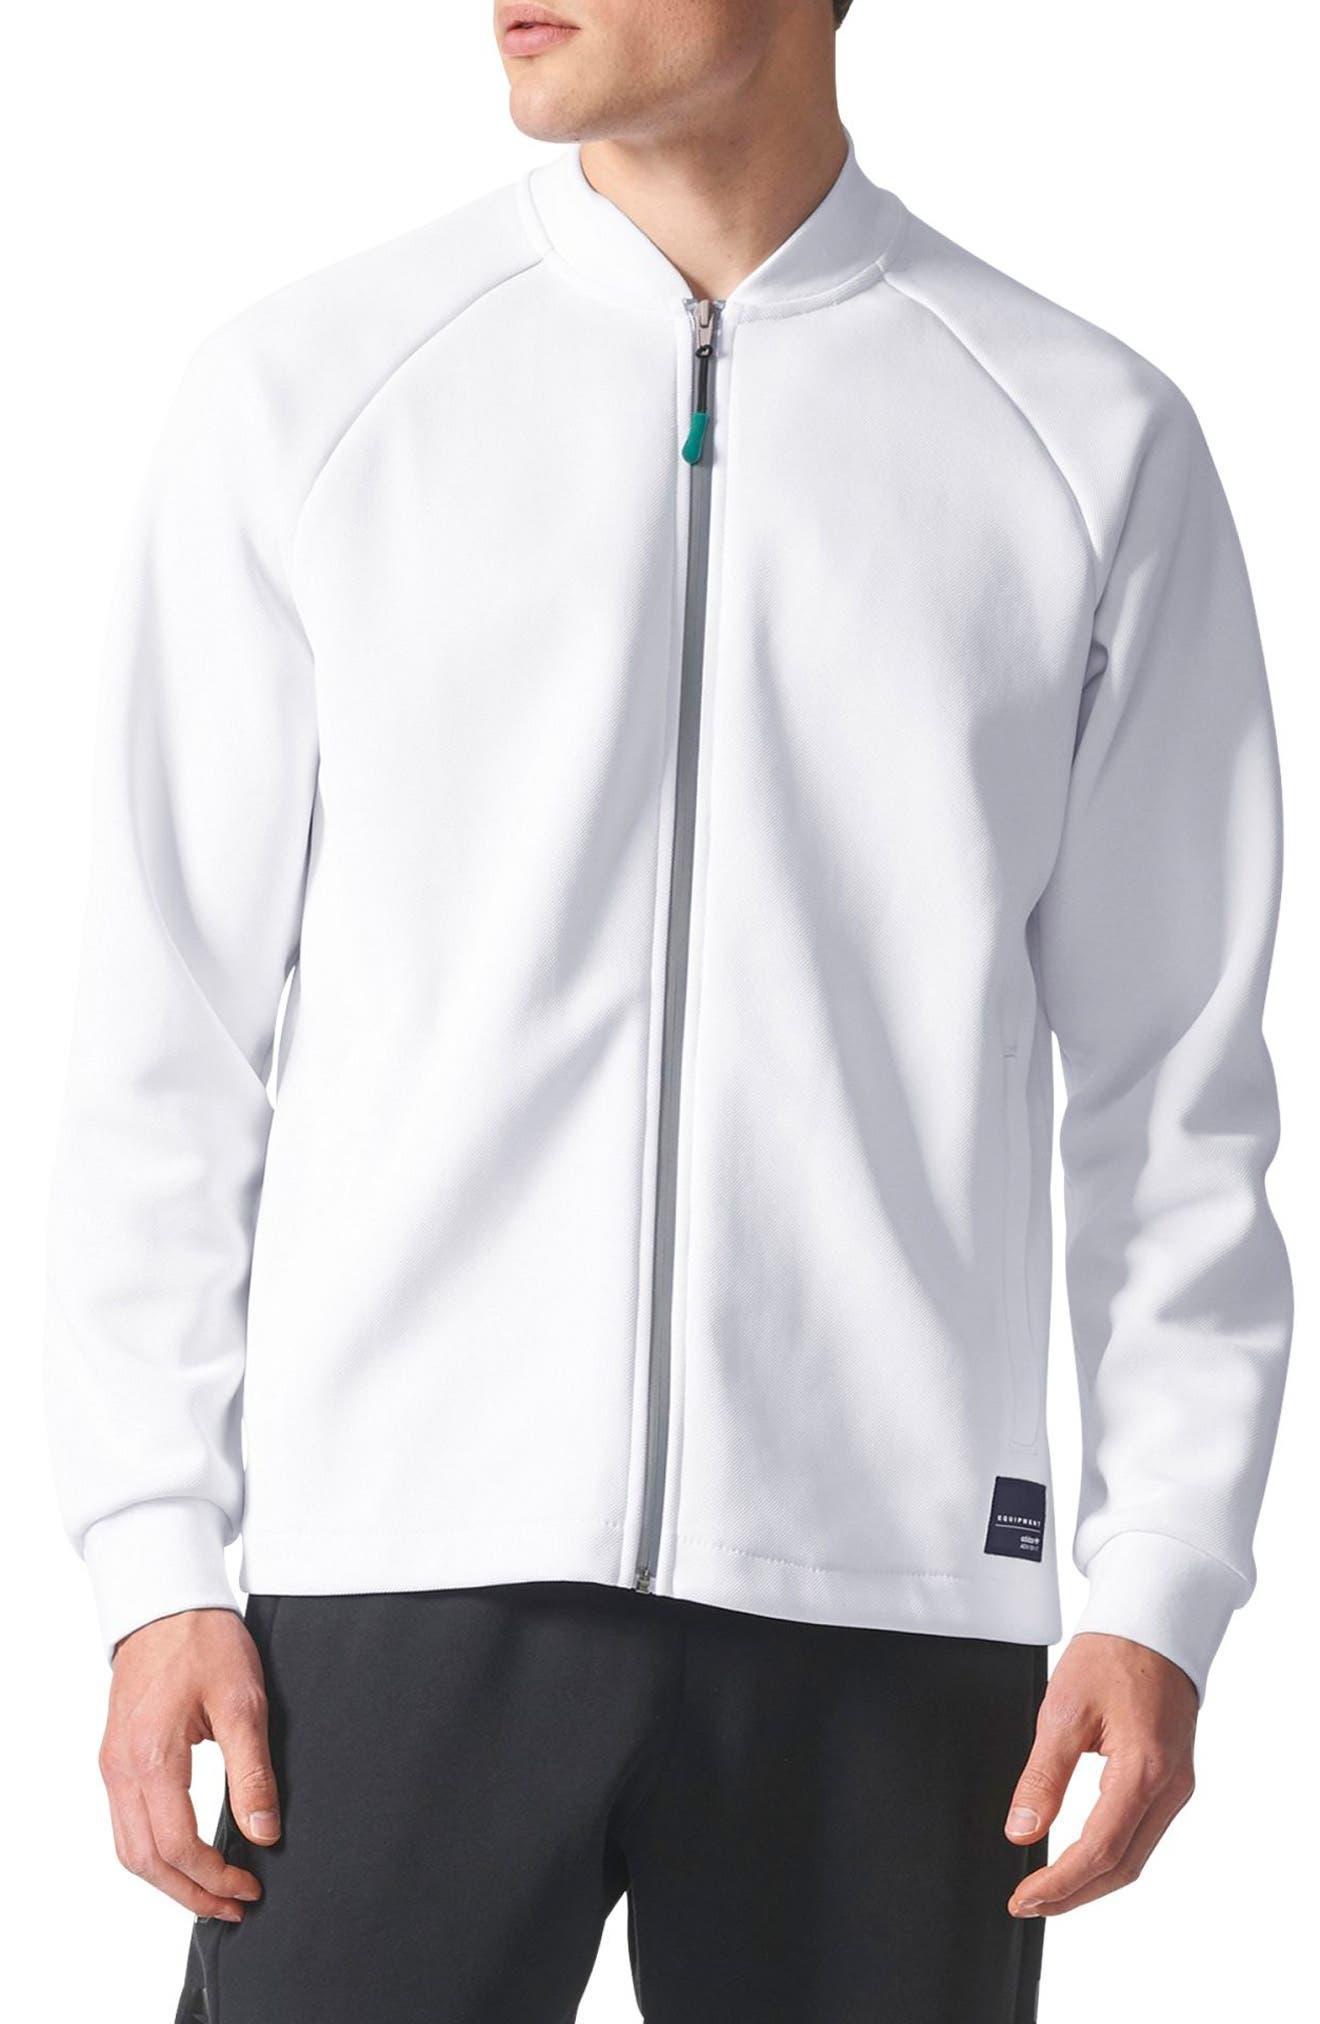 adidas Originals Equipment Hawthorne Track Jacket